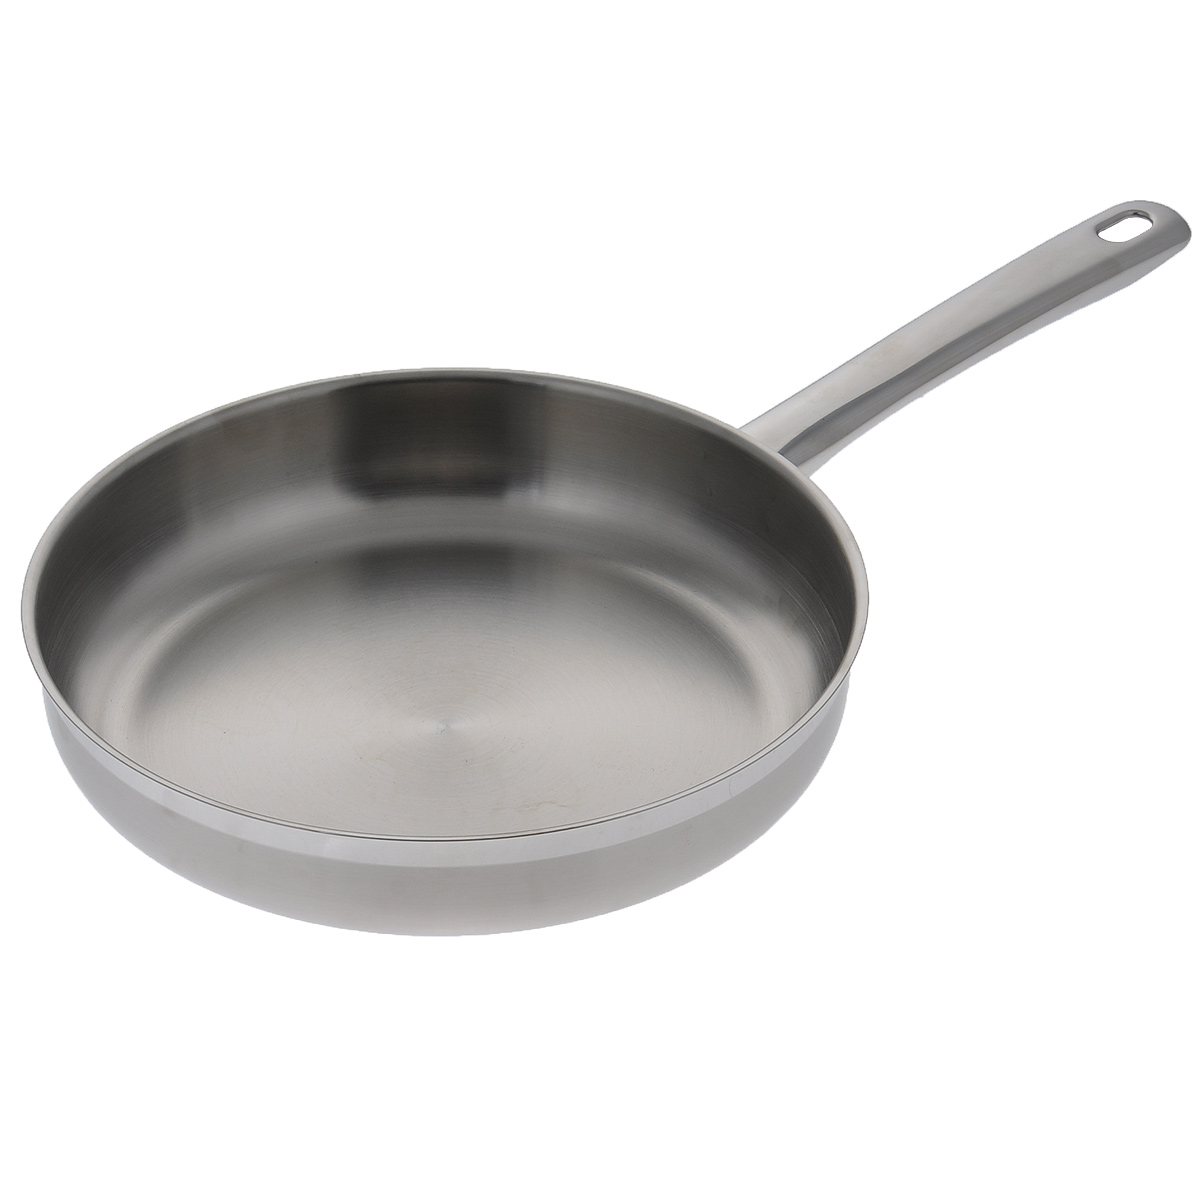 Сковорода Silampos Европа, цвет: металл, диаметр 24 см. 632123BM5124